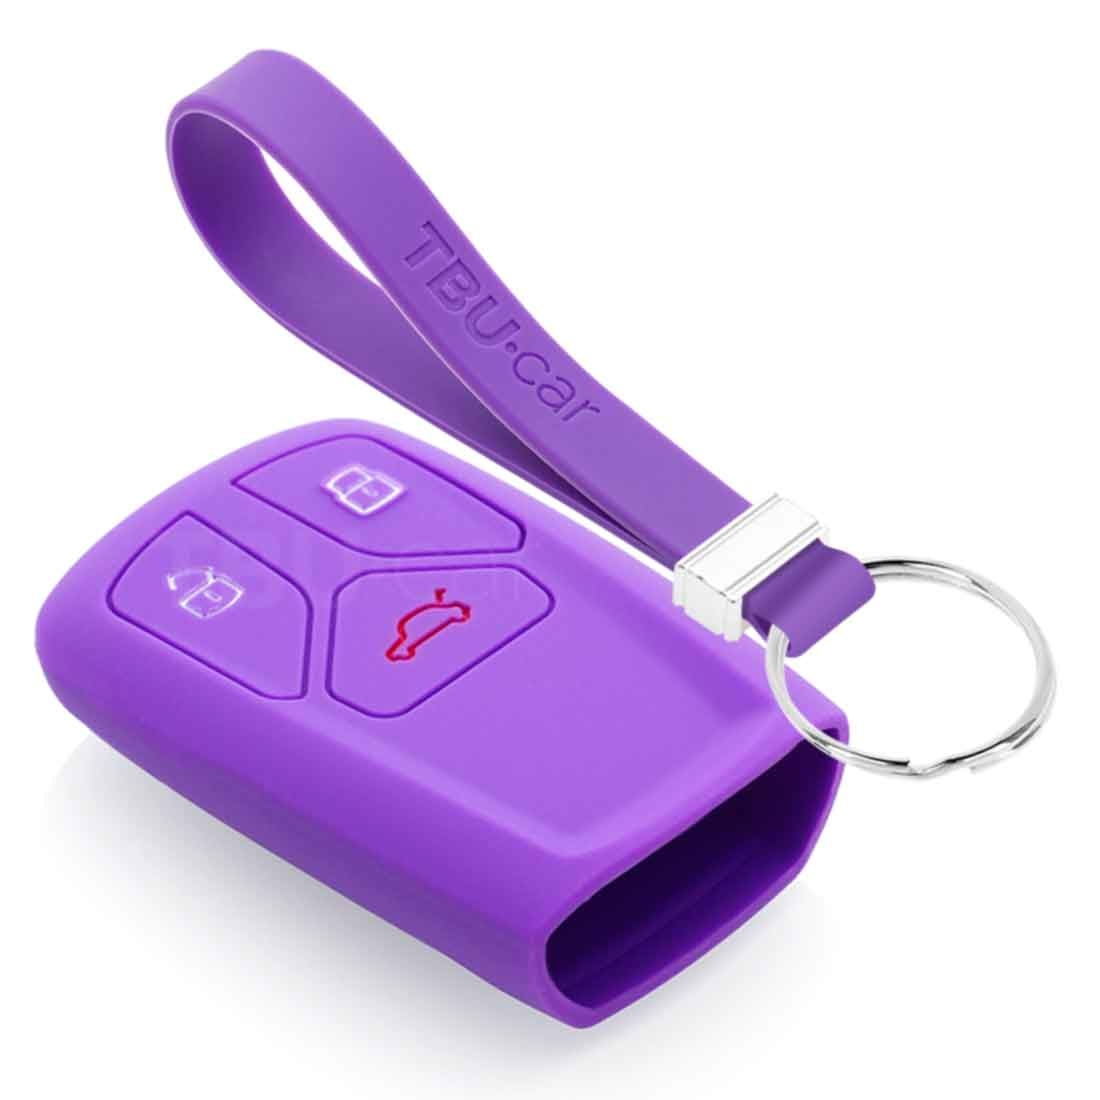 TBU car TBU car Car key cover compatible with Audi - Silicone Protective Remote Key Shell - FOB Case Cover - Purple